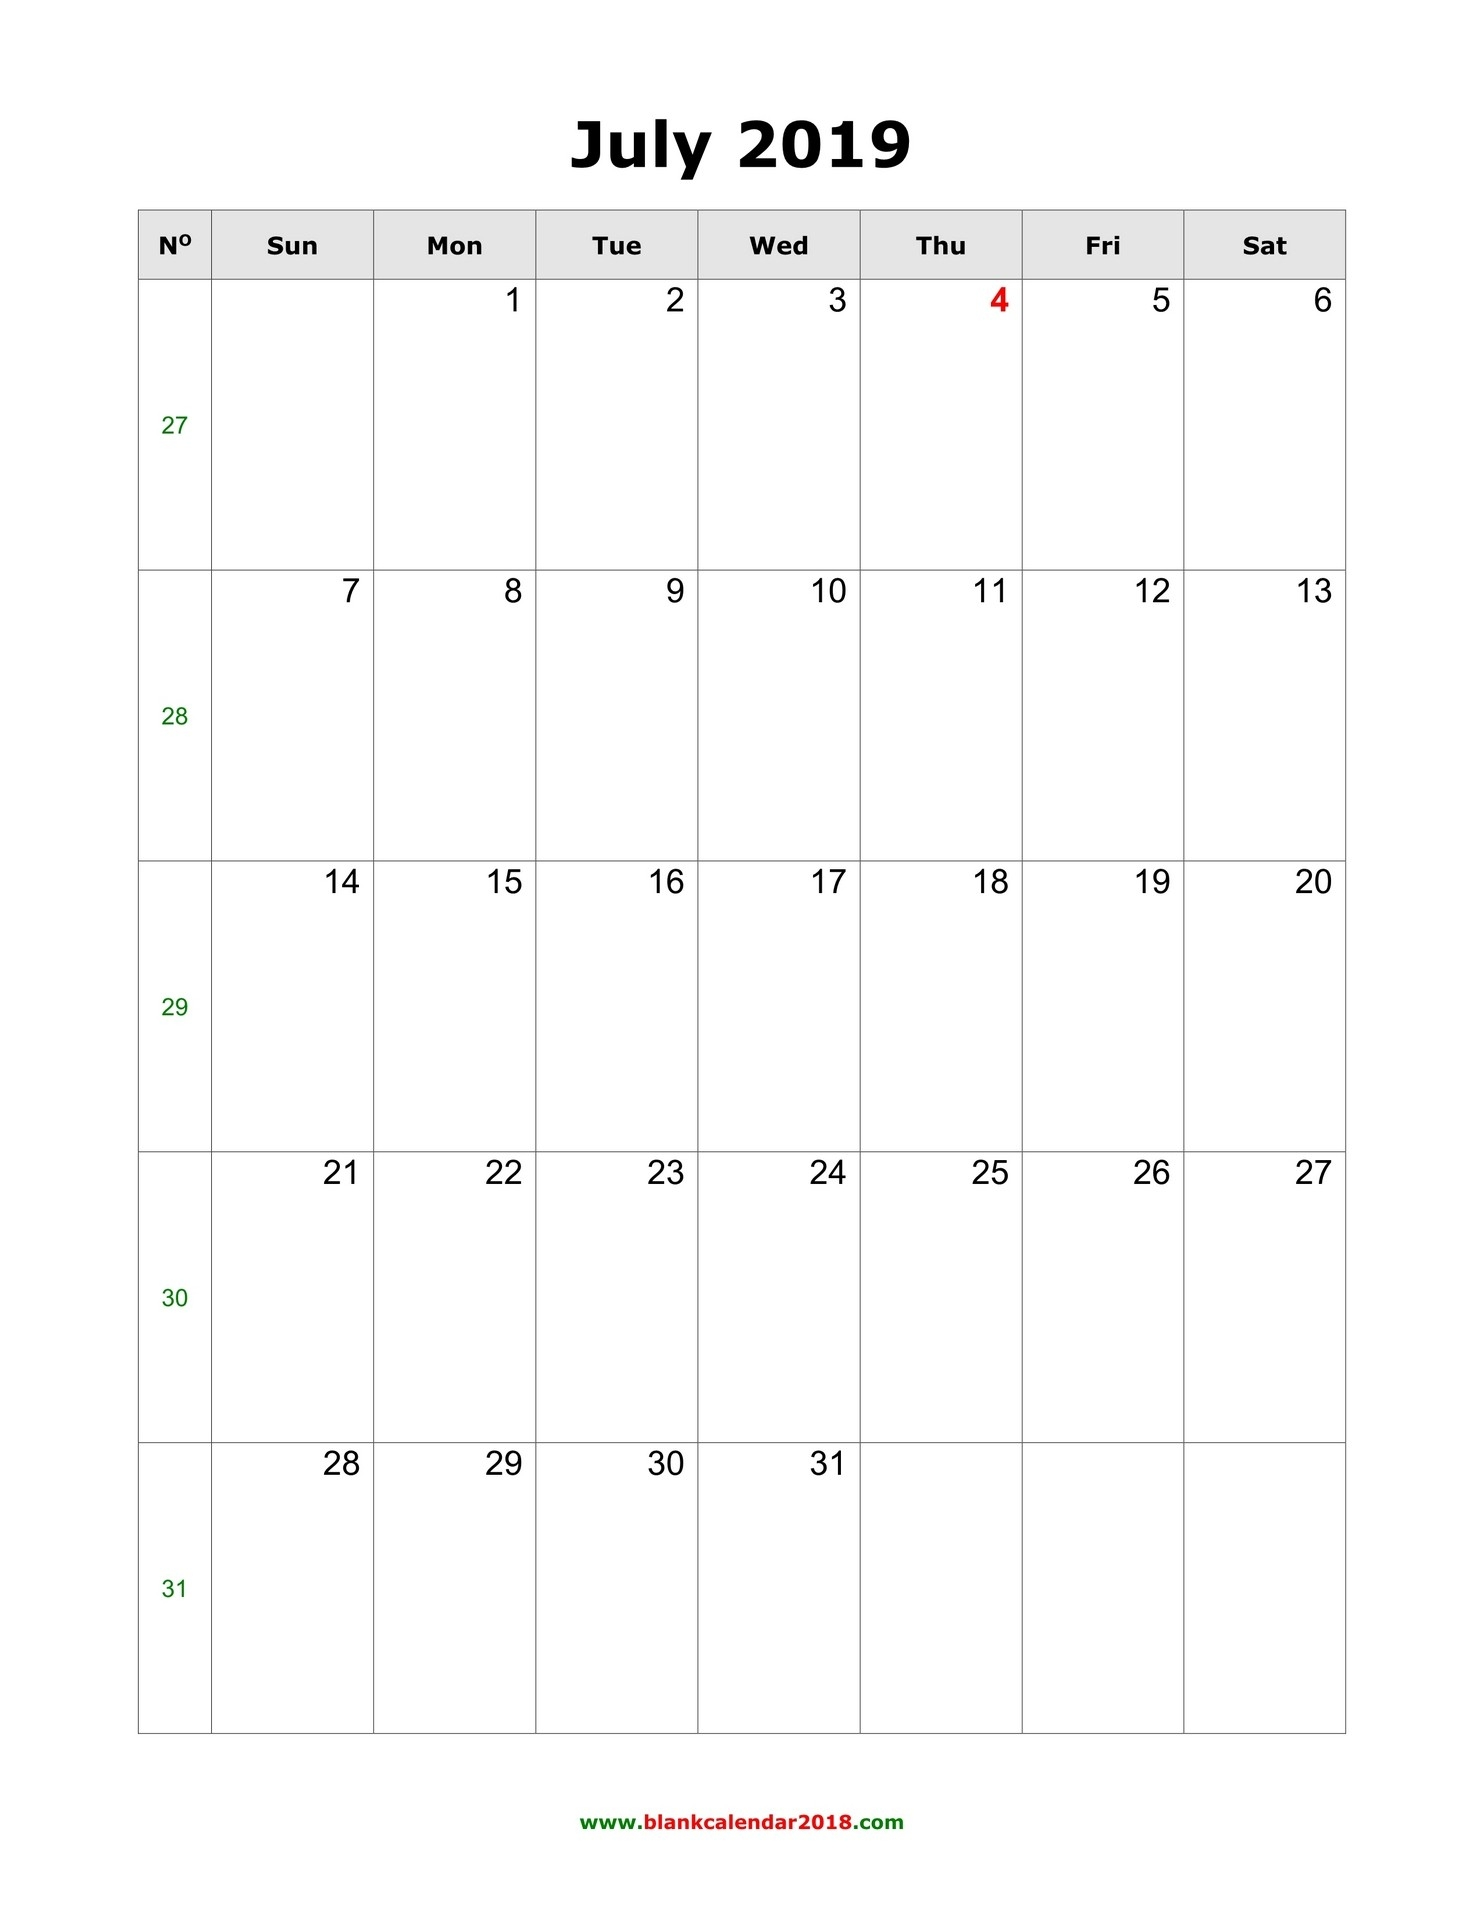 Blank Calendar For July 2019-Fill In The Blank July 2919 Calendar